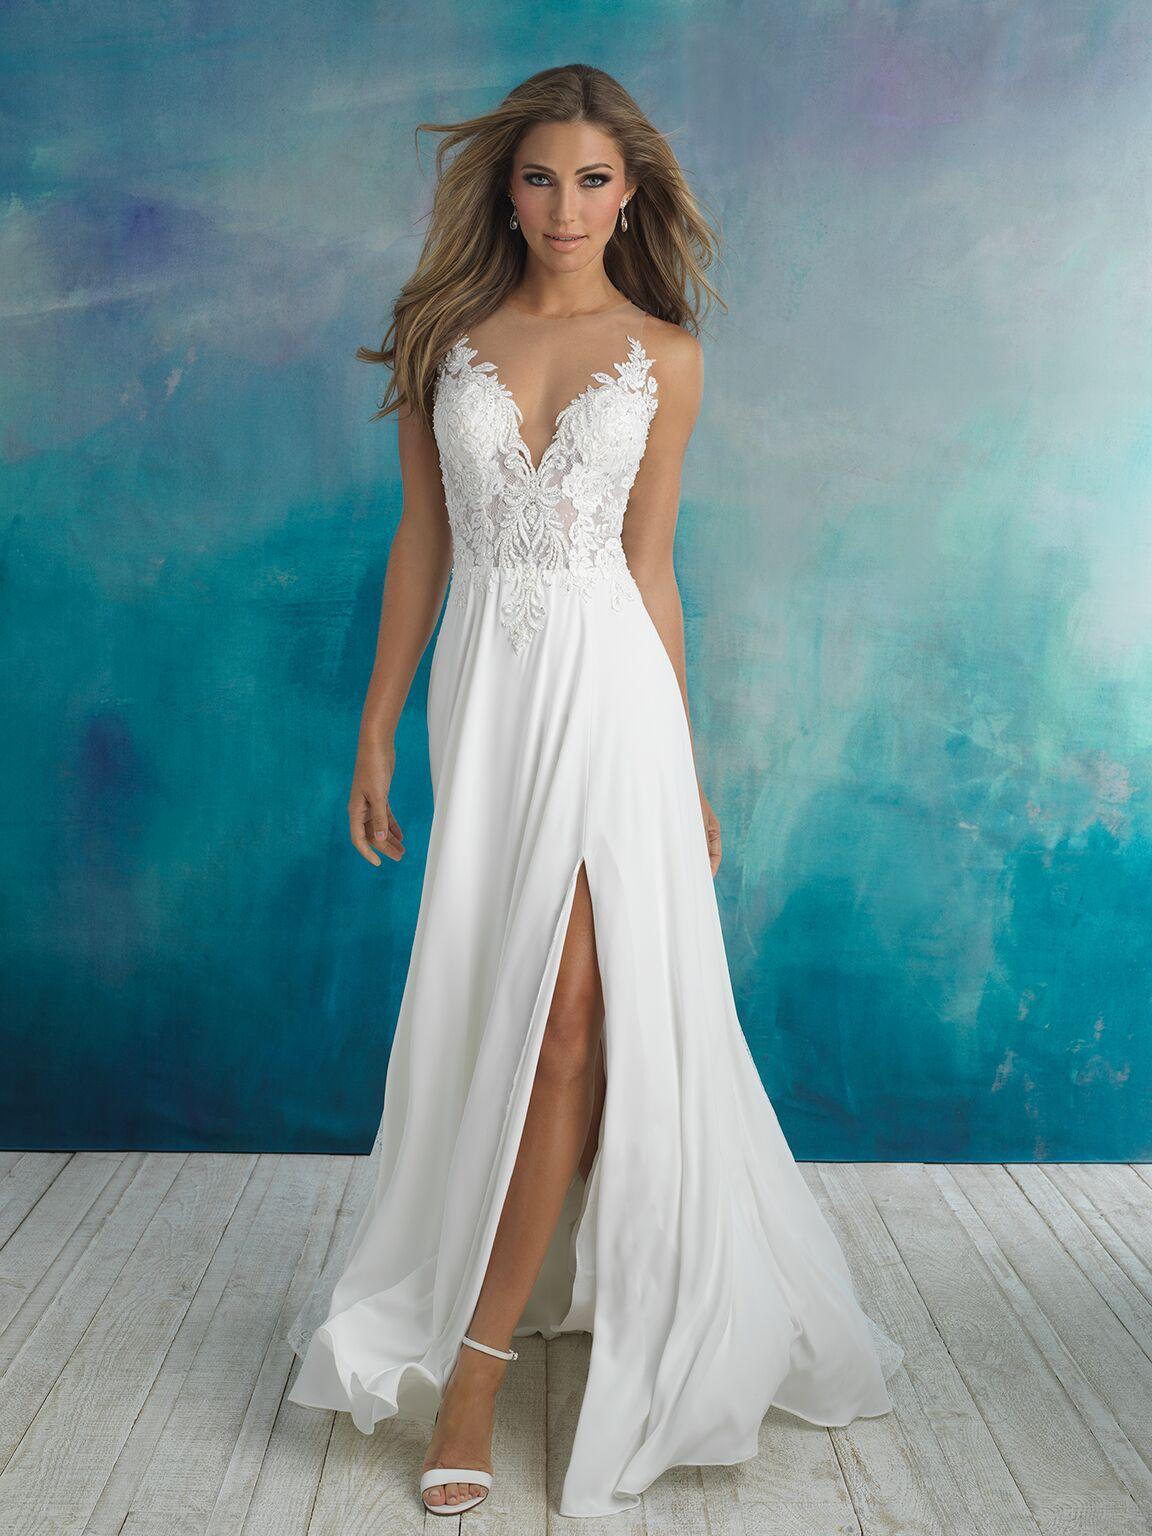 44d422461b07 Wedding Dress Stores Chicago Il